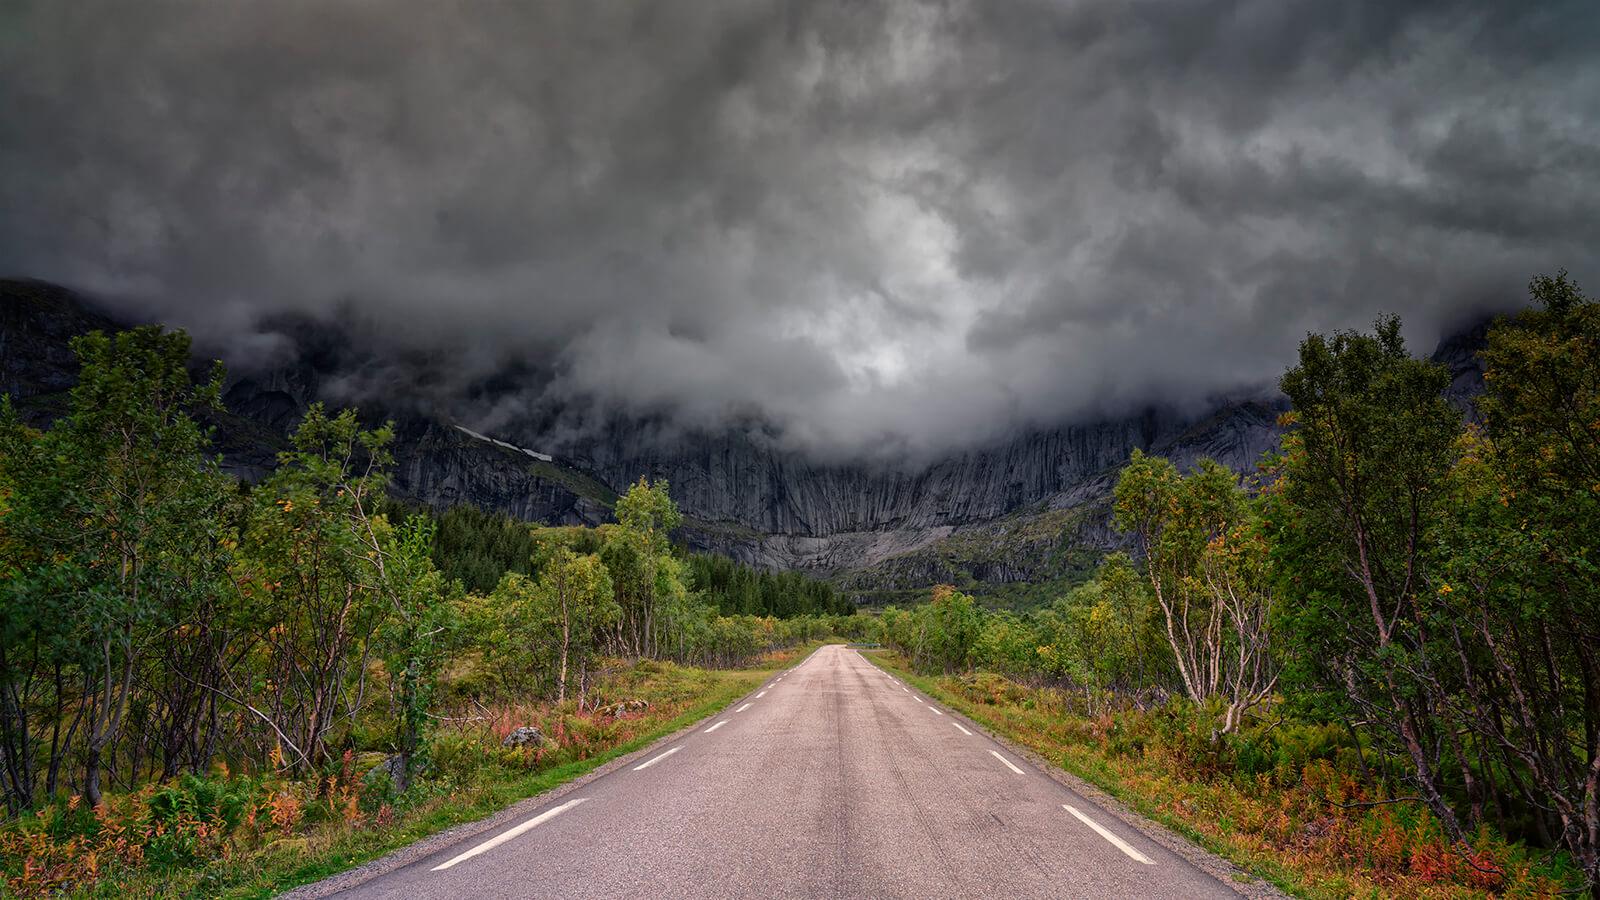 Road less traveled, Joakim Jormelin